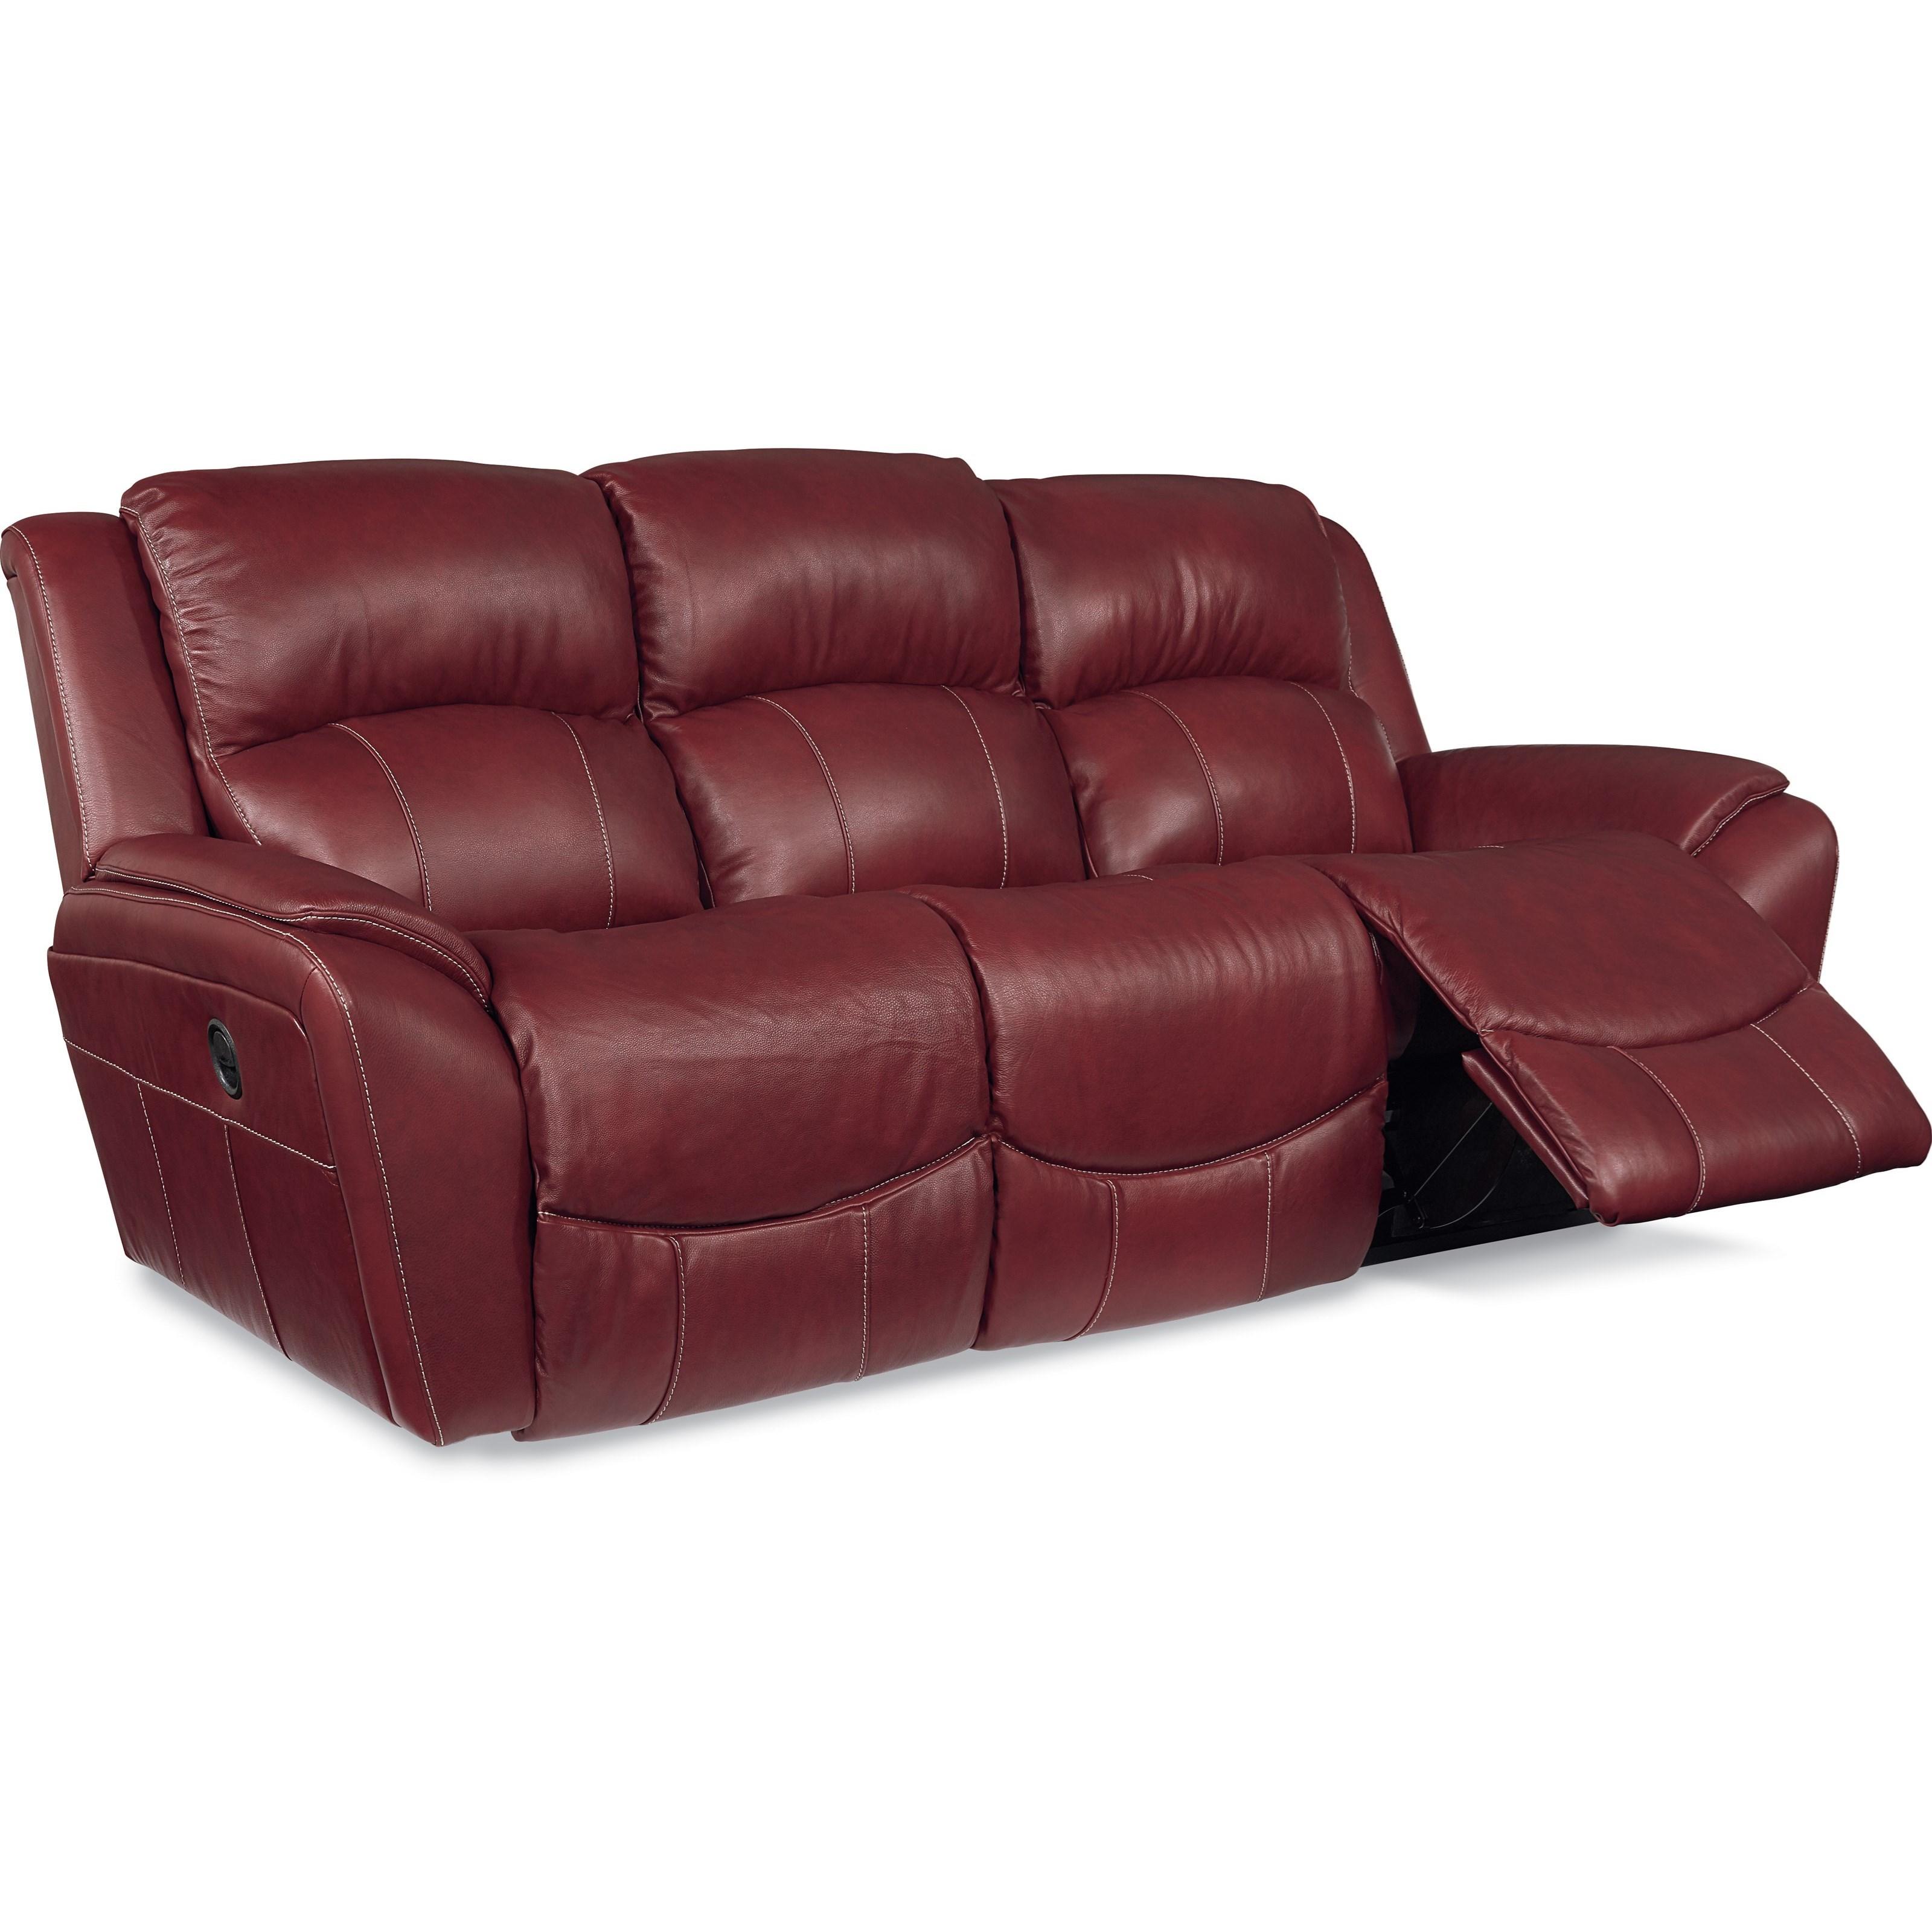 La Z Boy Barrett Casual La Z Time 174 Full Reclining Sofa